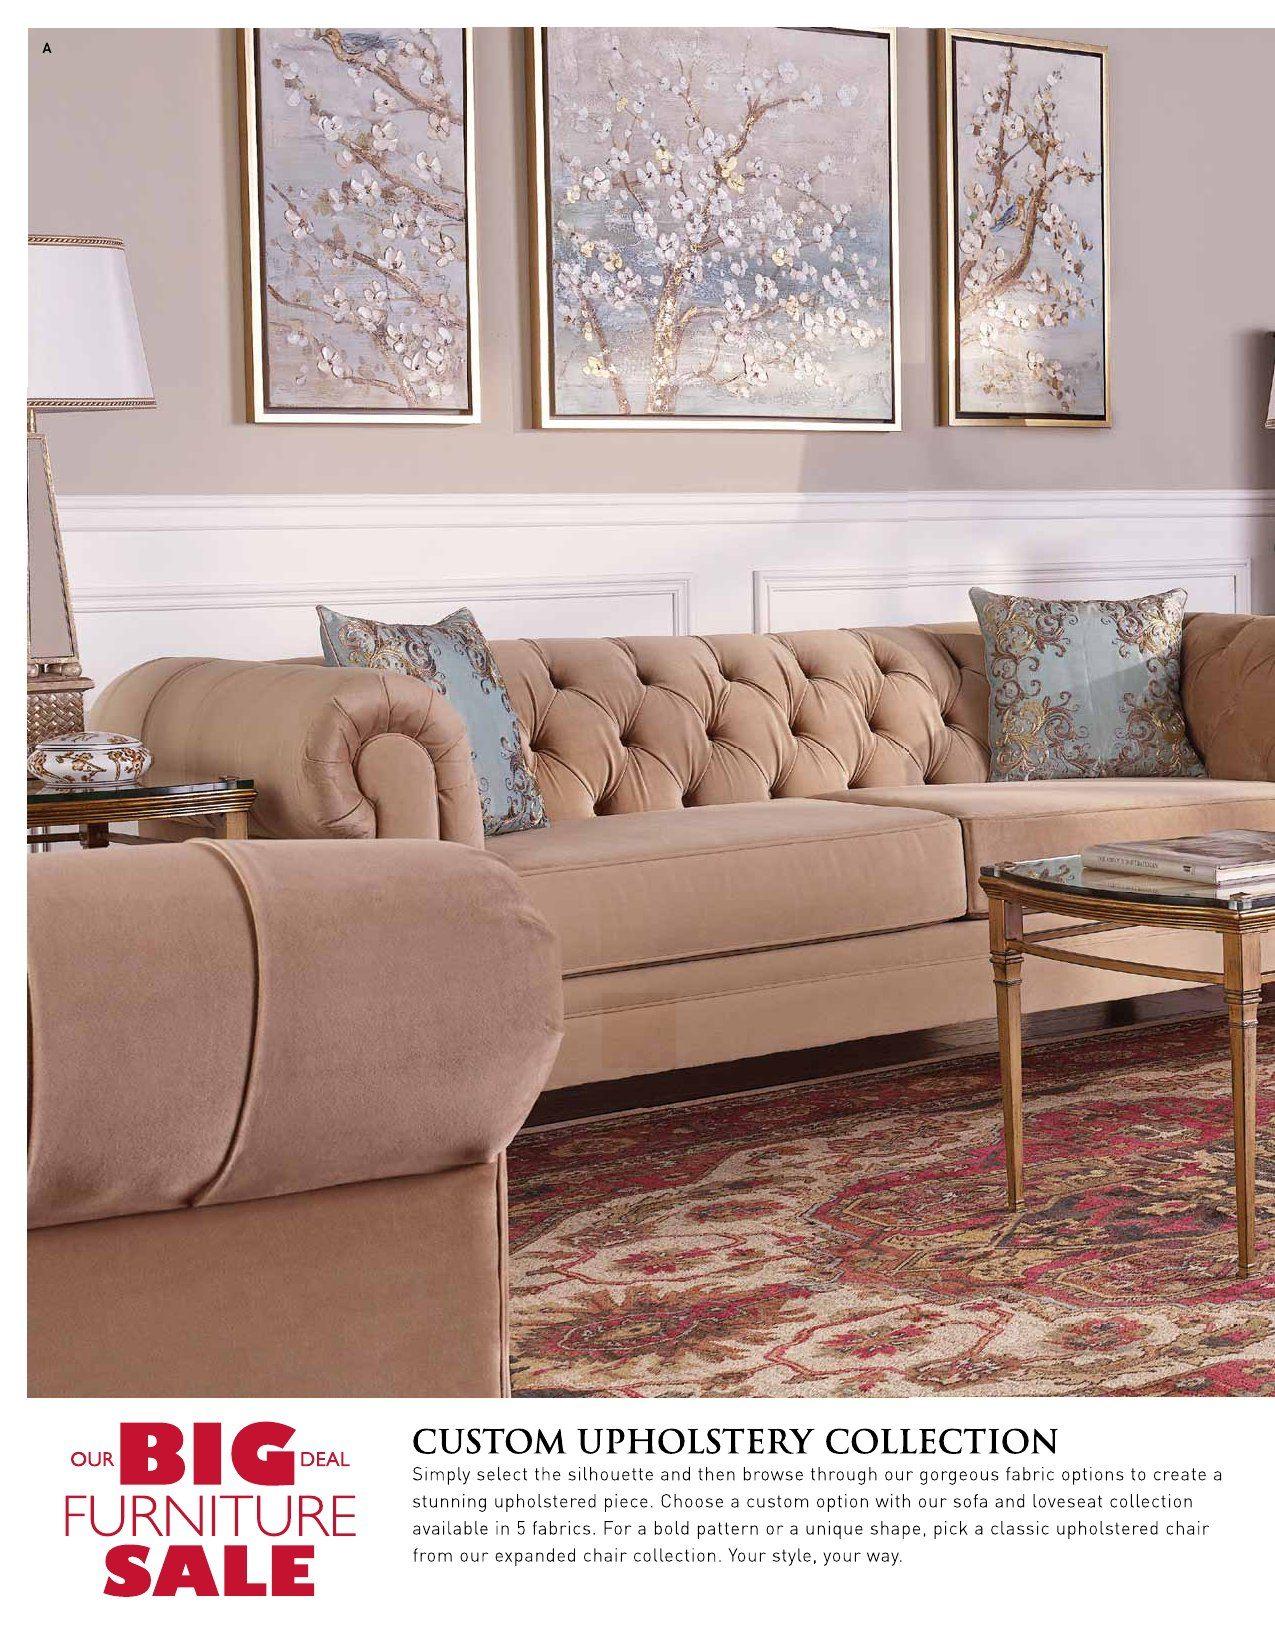 Bombay Weekly Flyer   Our Big Deal Furniture Sale   Jun 20 U2013 Jul 4    RedFlagDeals.com